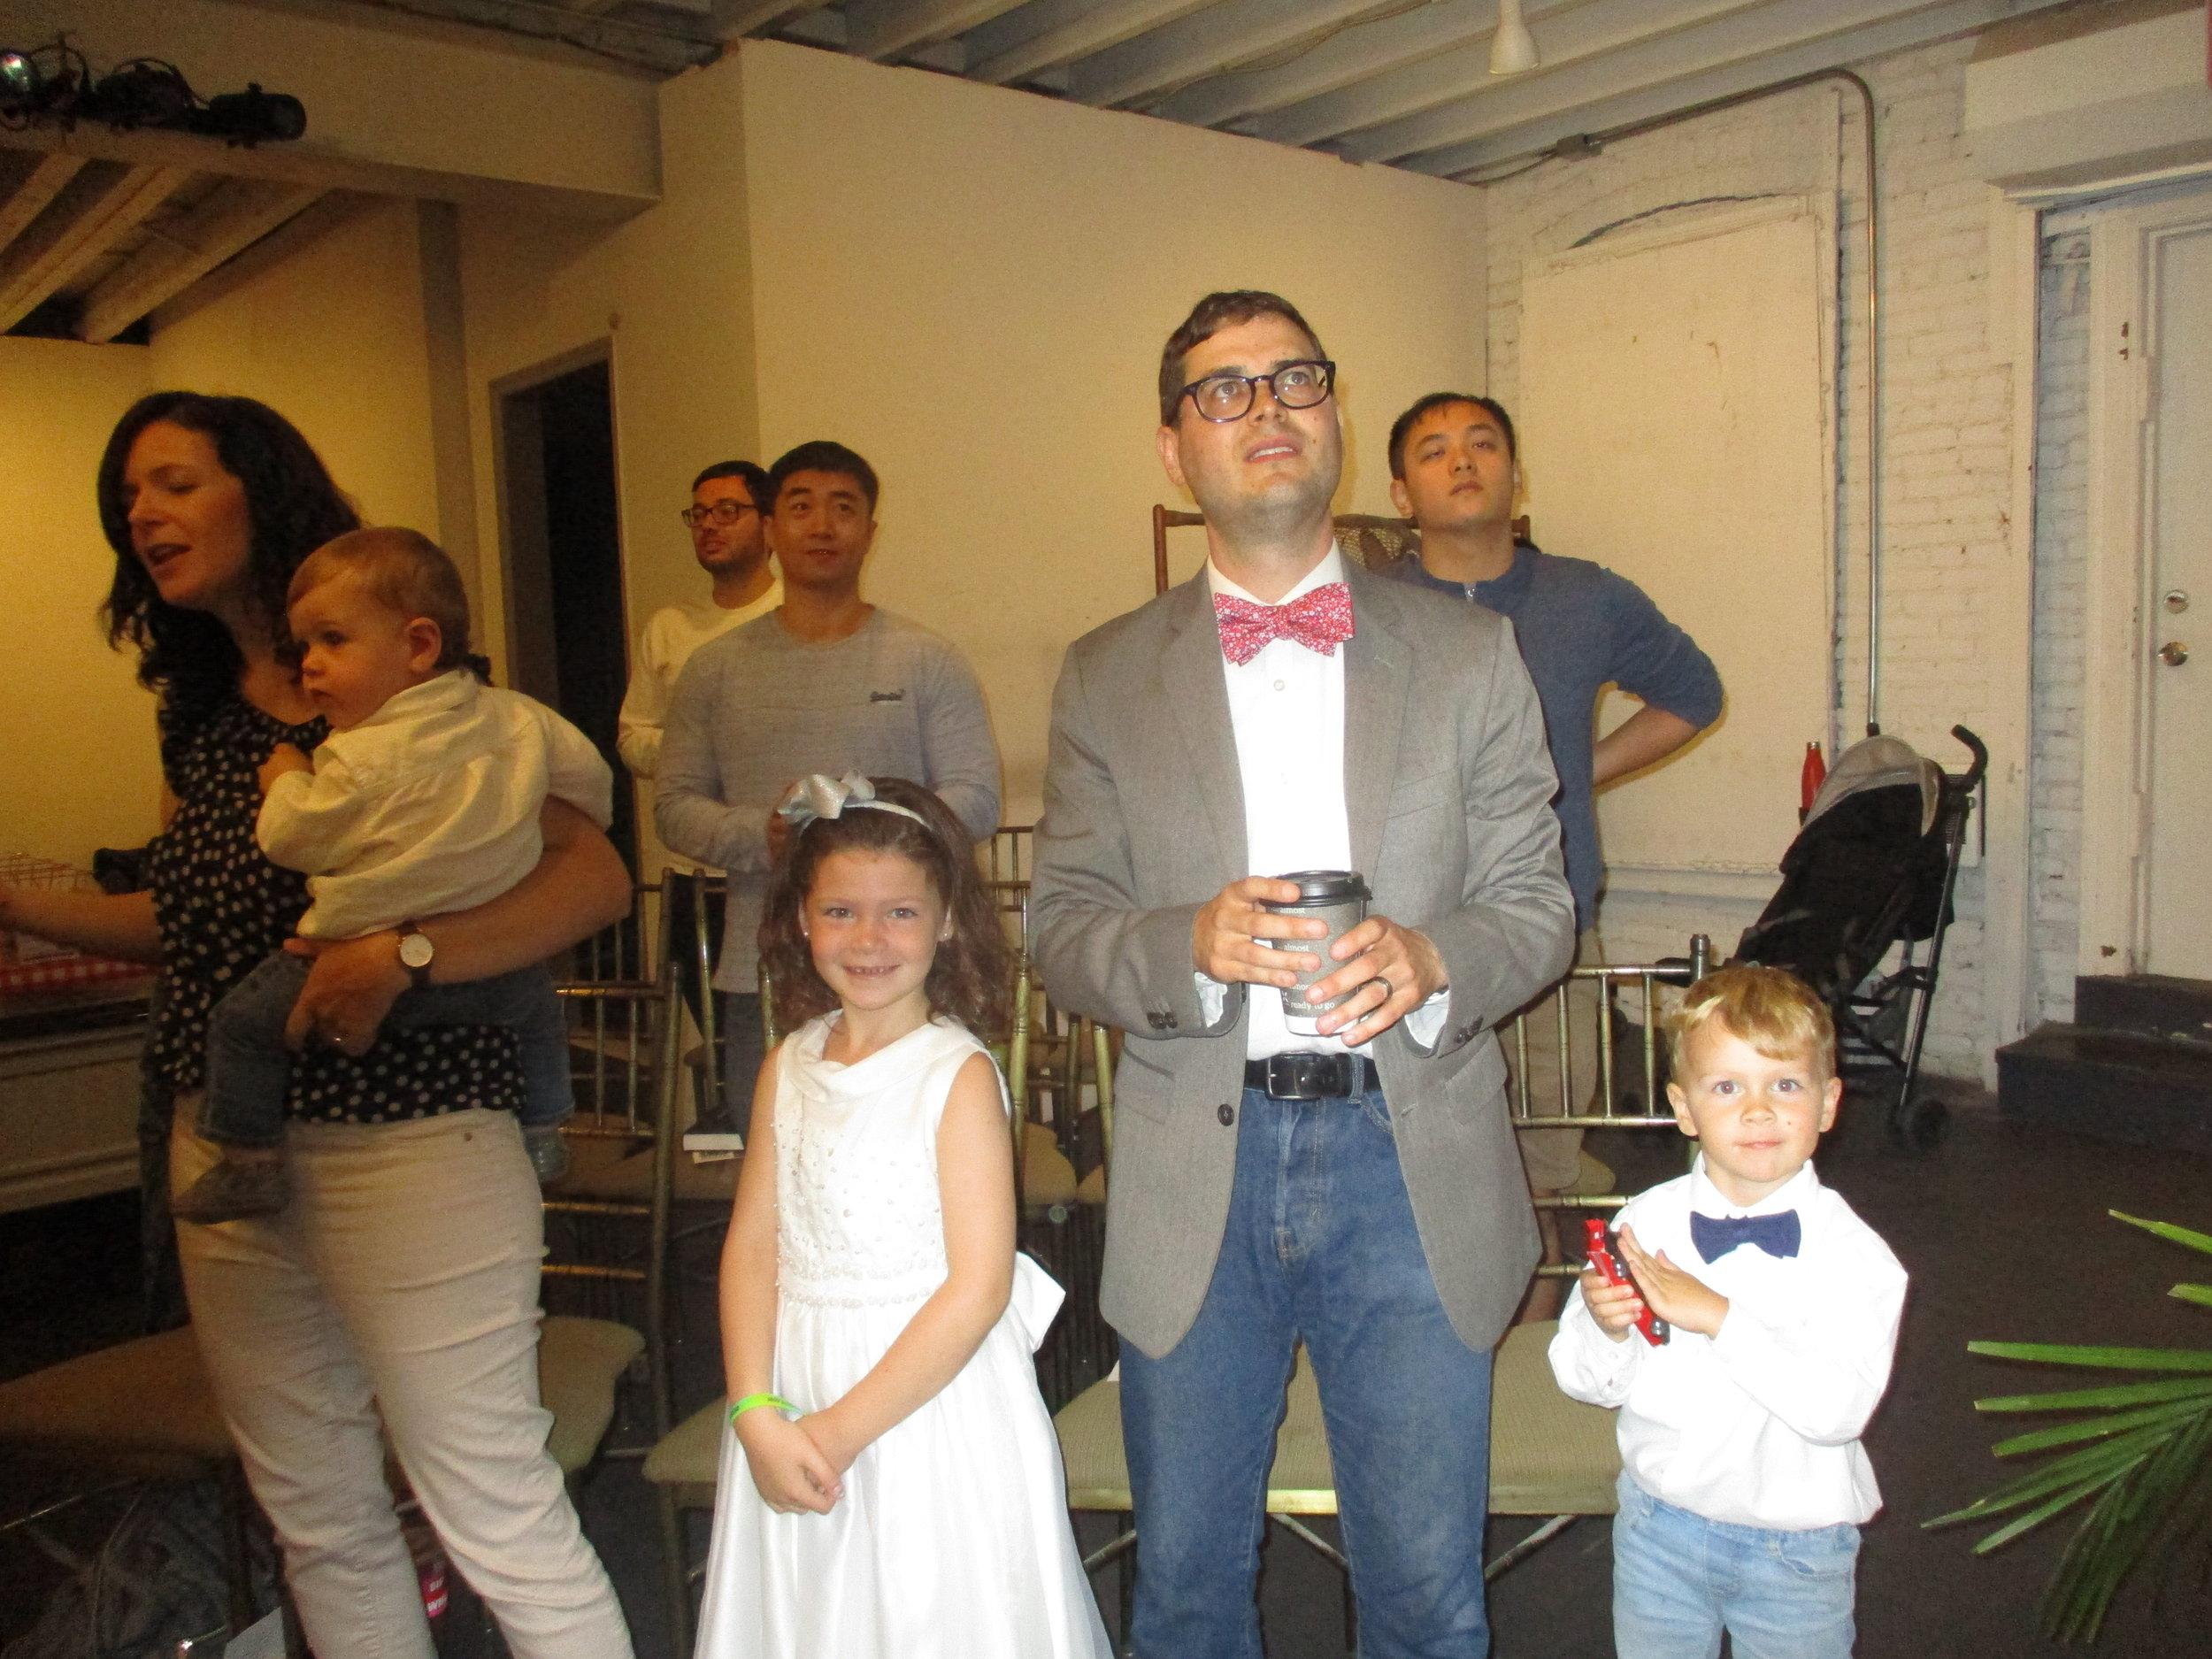 Stephen and Sonia Sollard and children